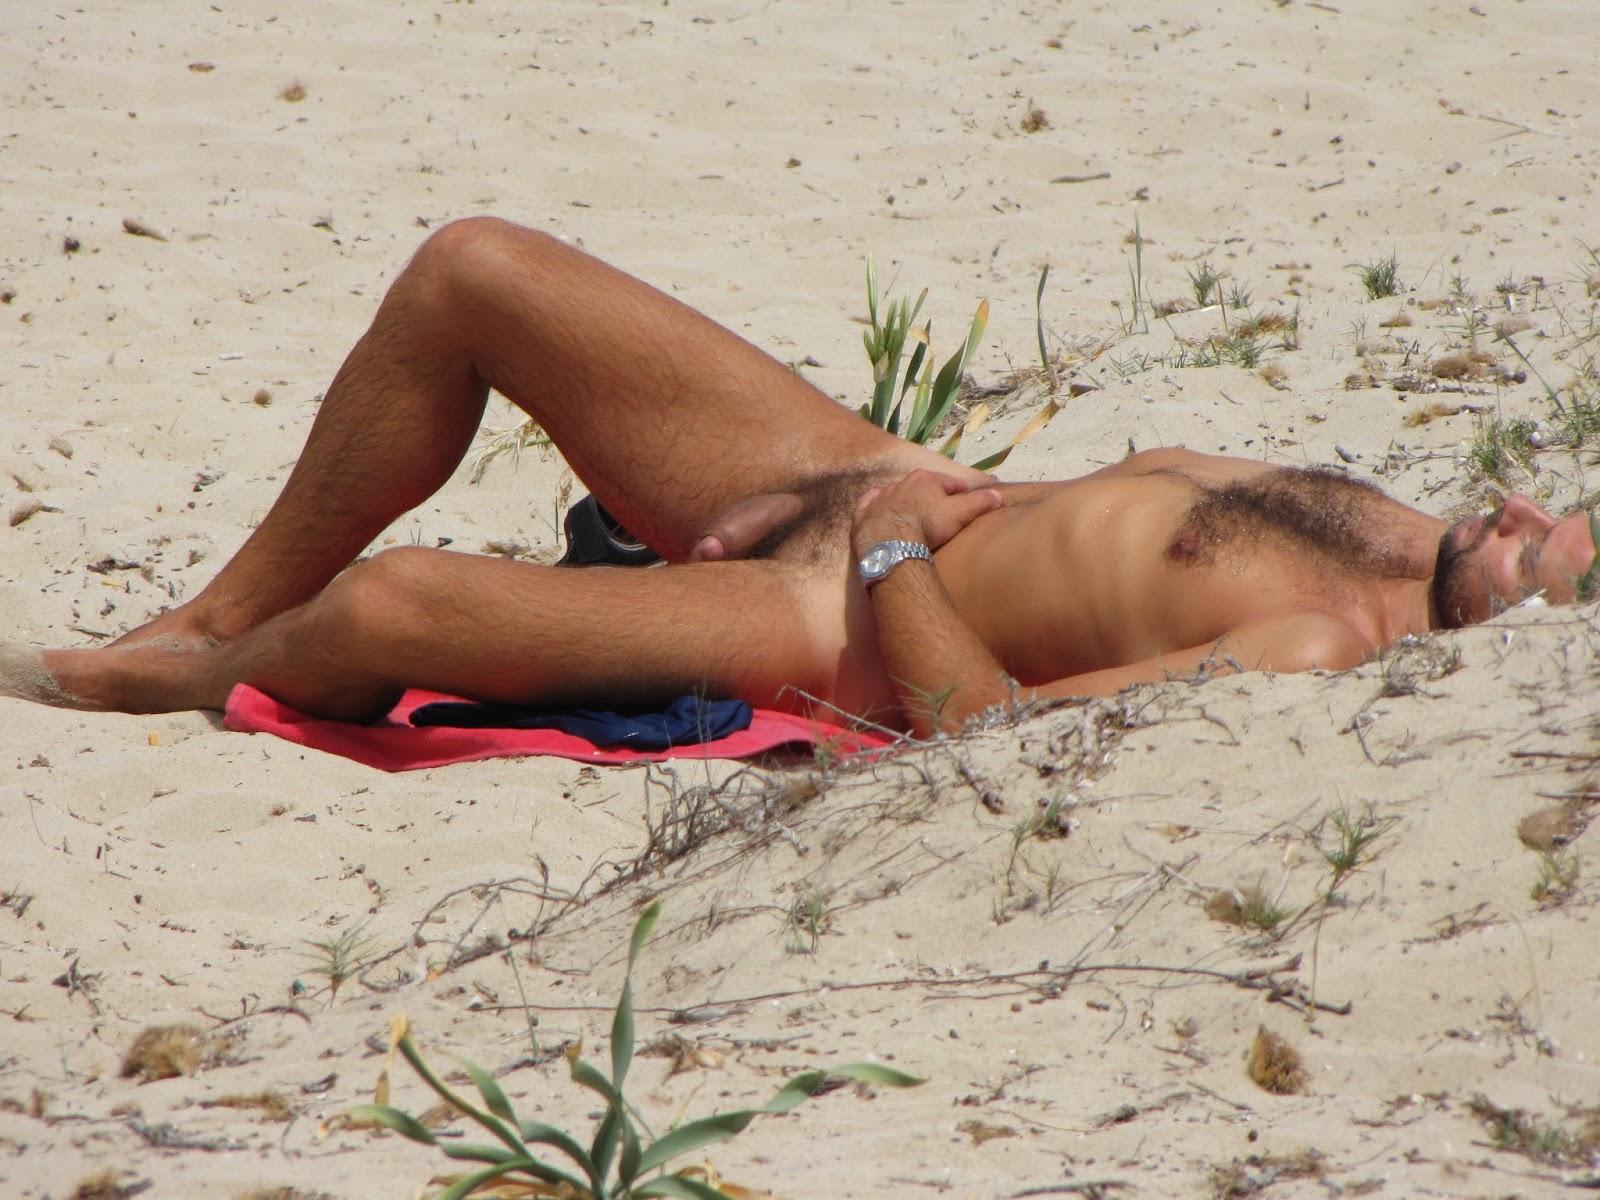 Gay Men At Nude Beach